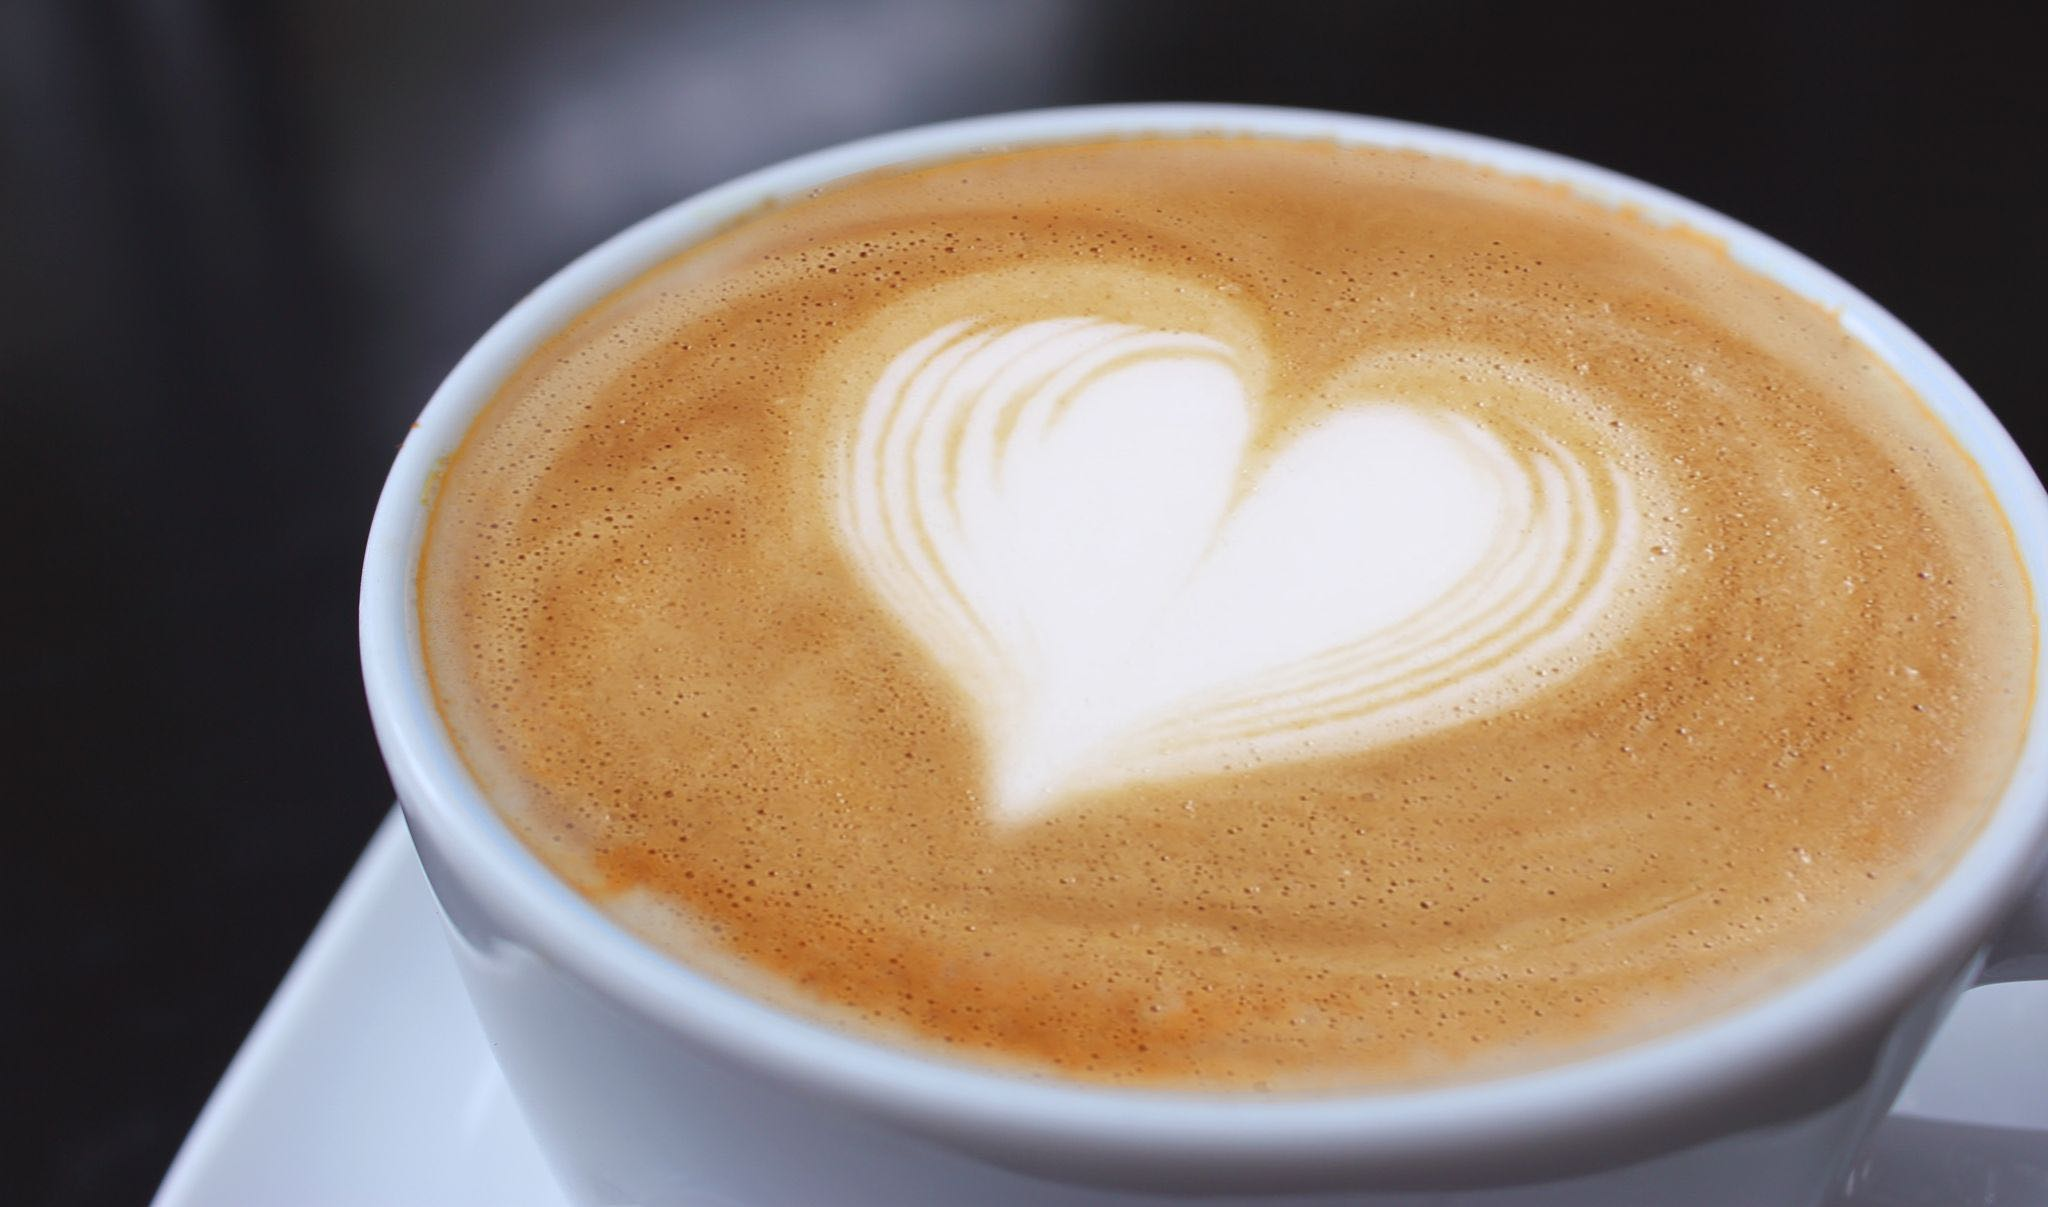 https://nozbe.com/images/coffee.jpg